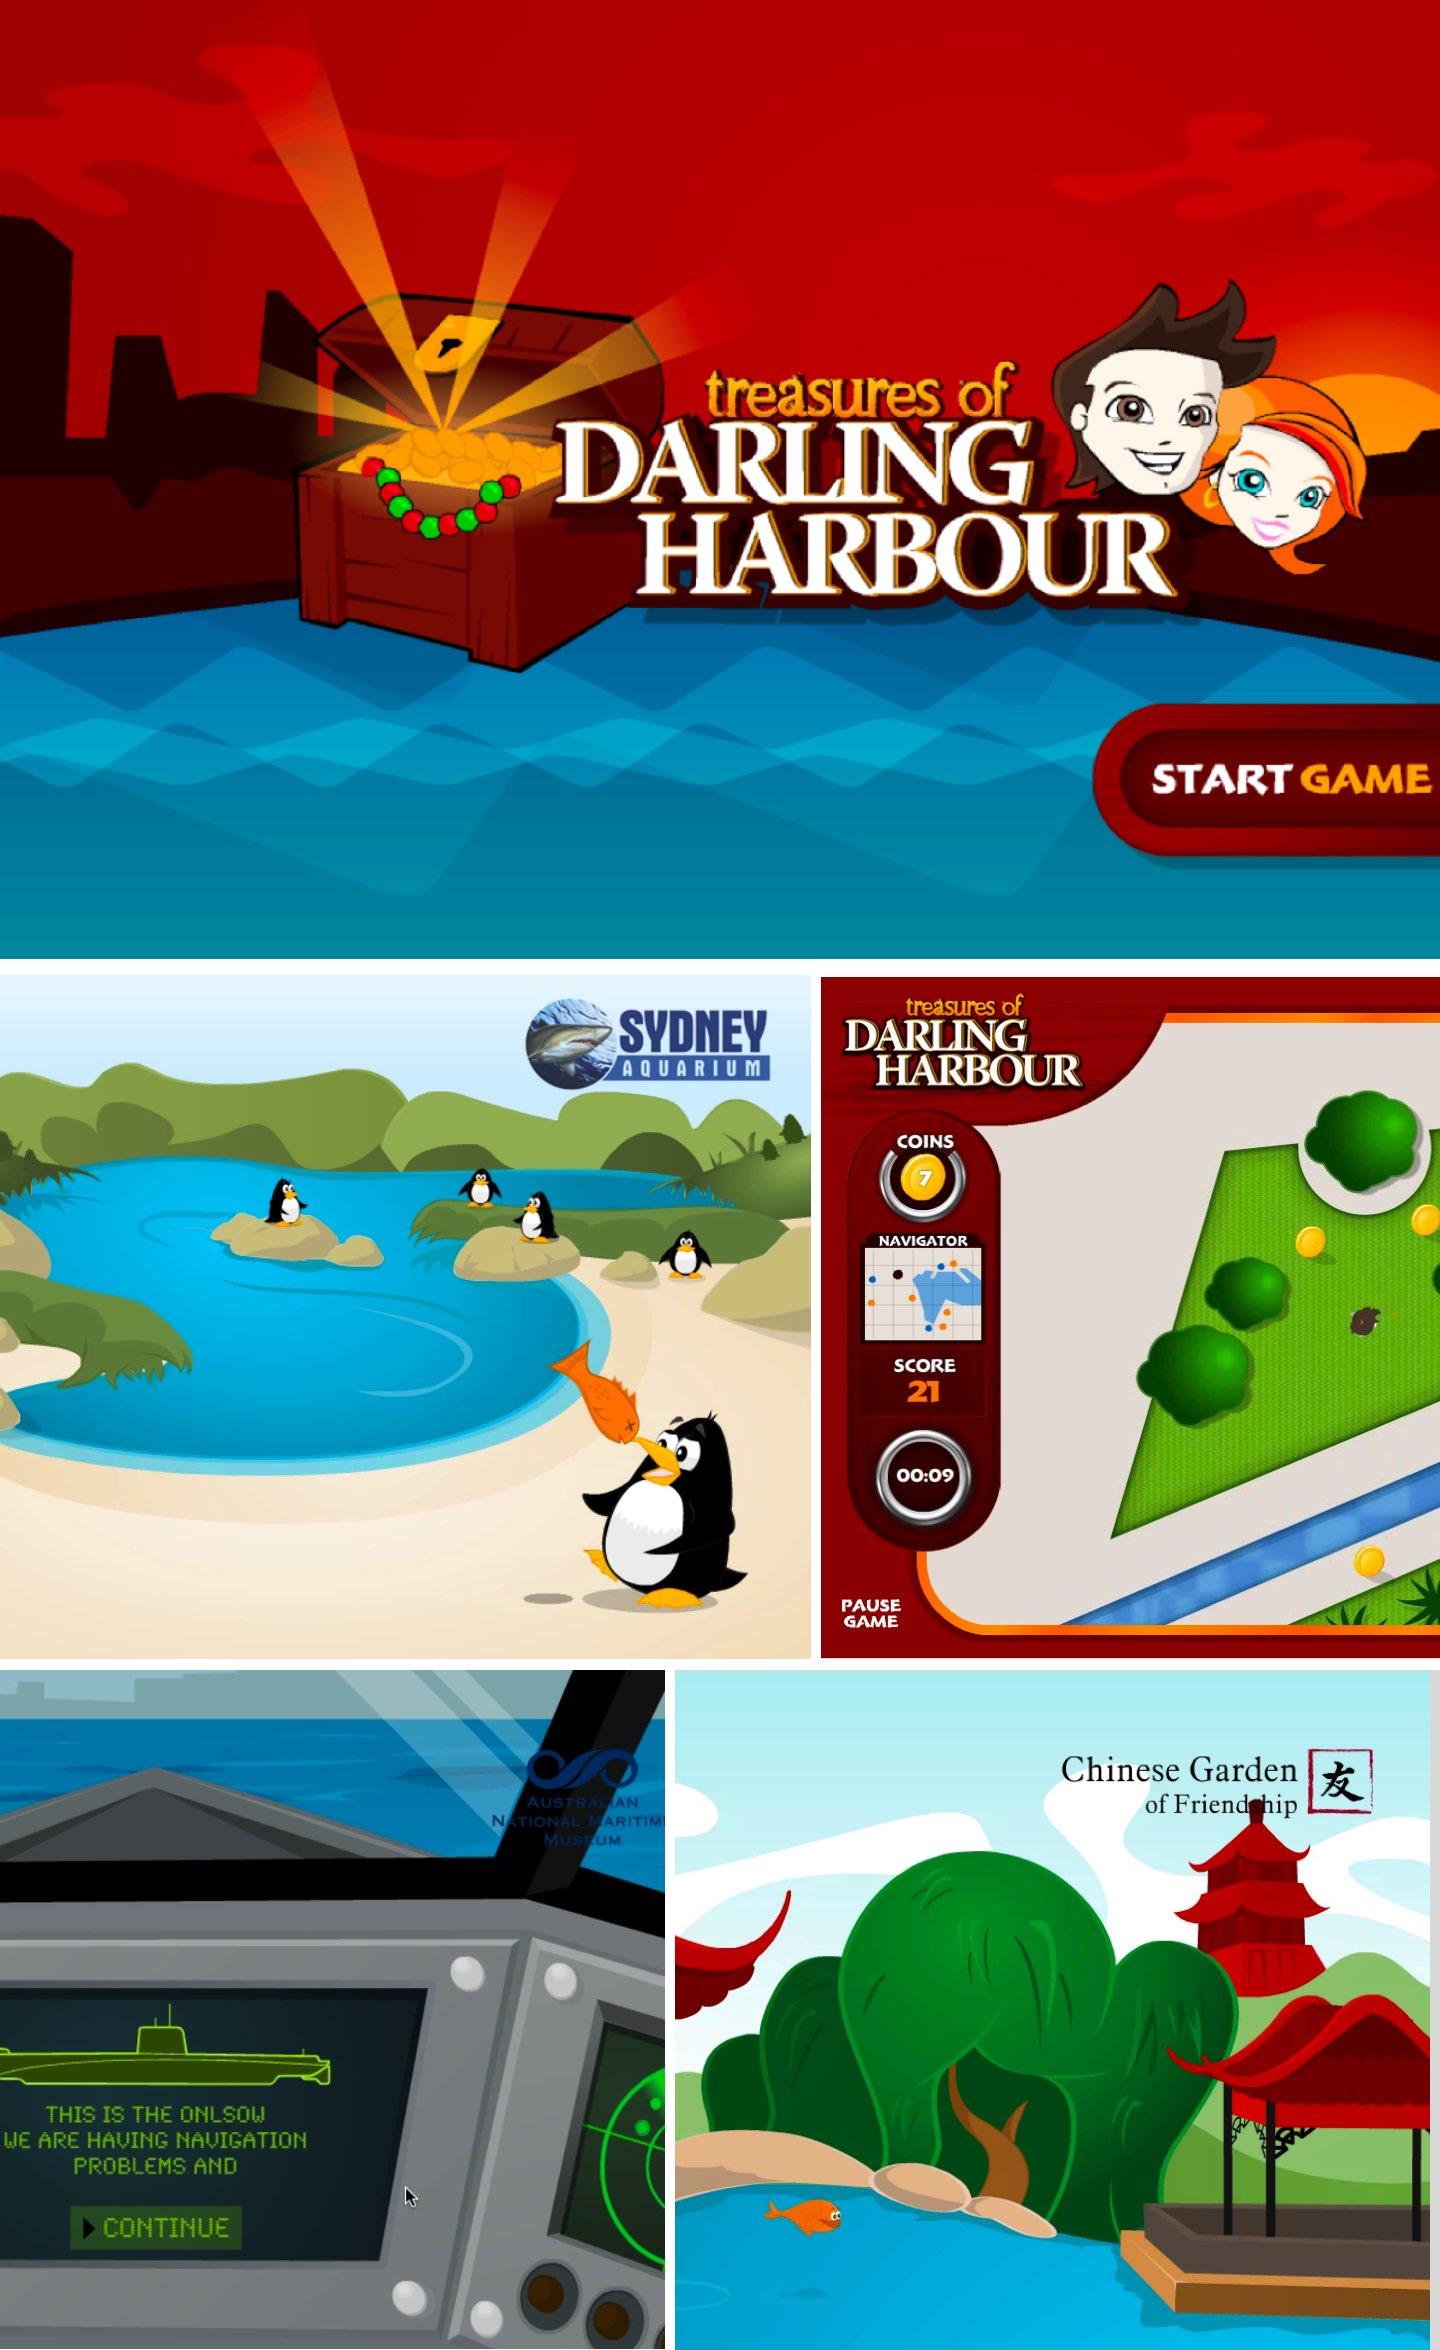 treasures of Darling Harbour game